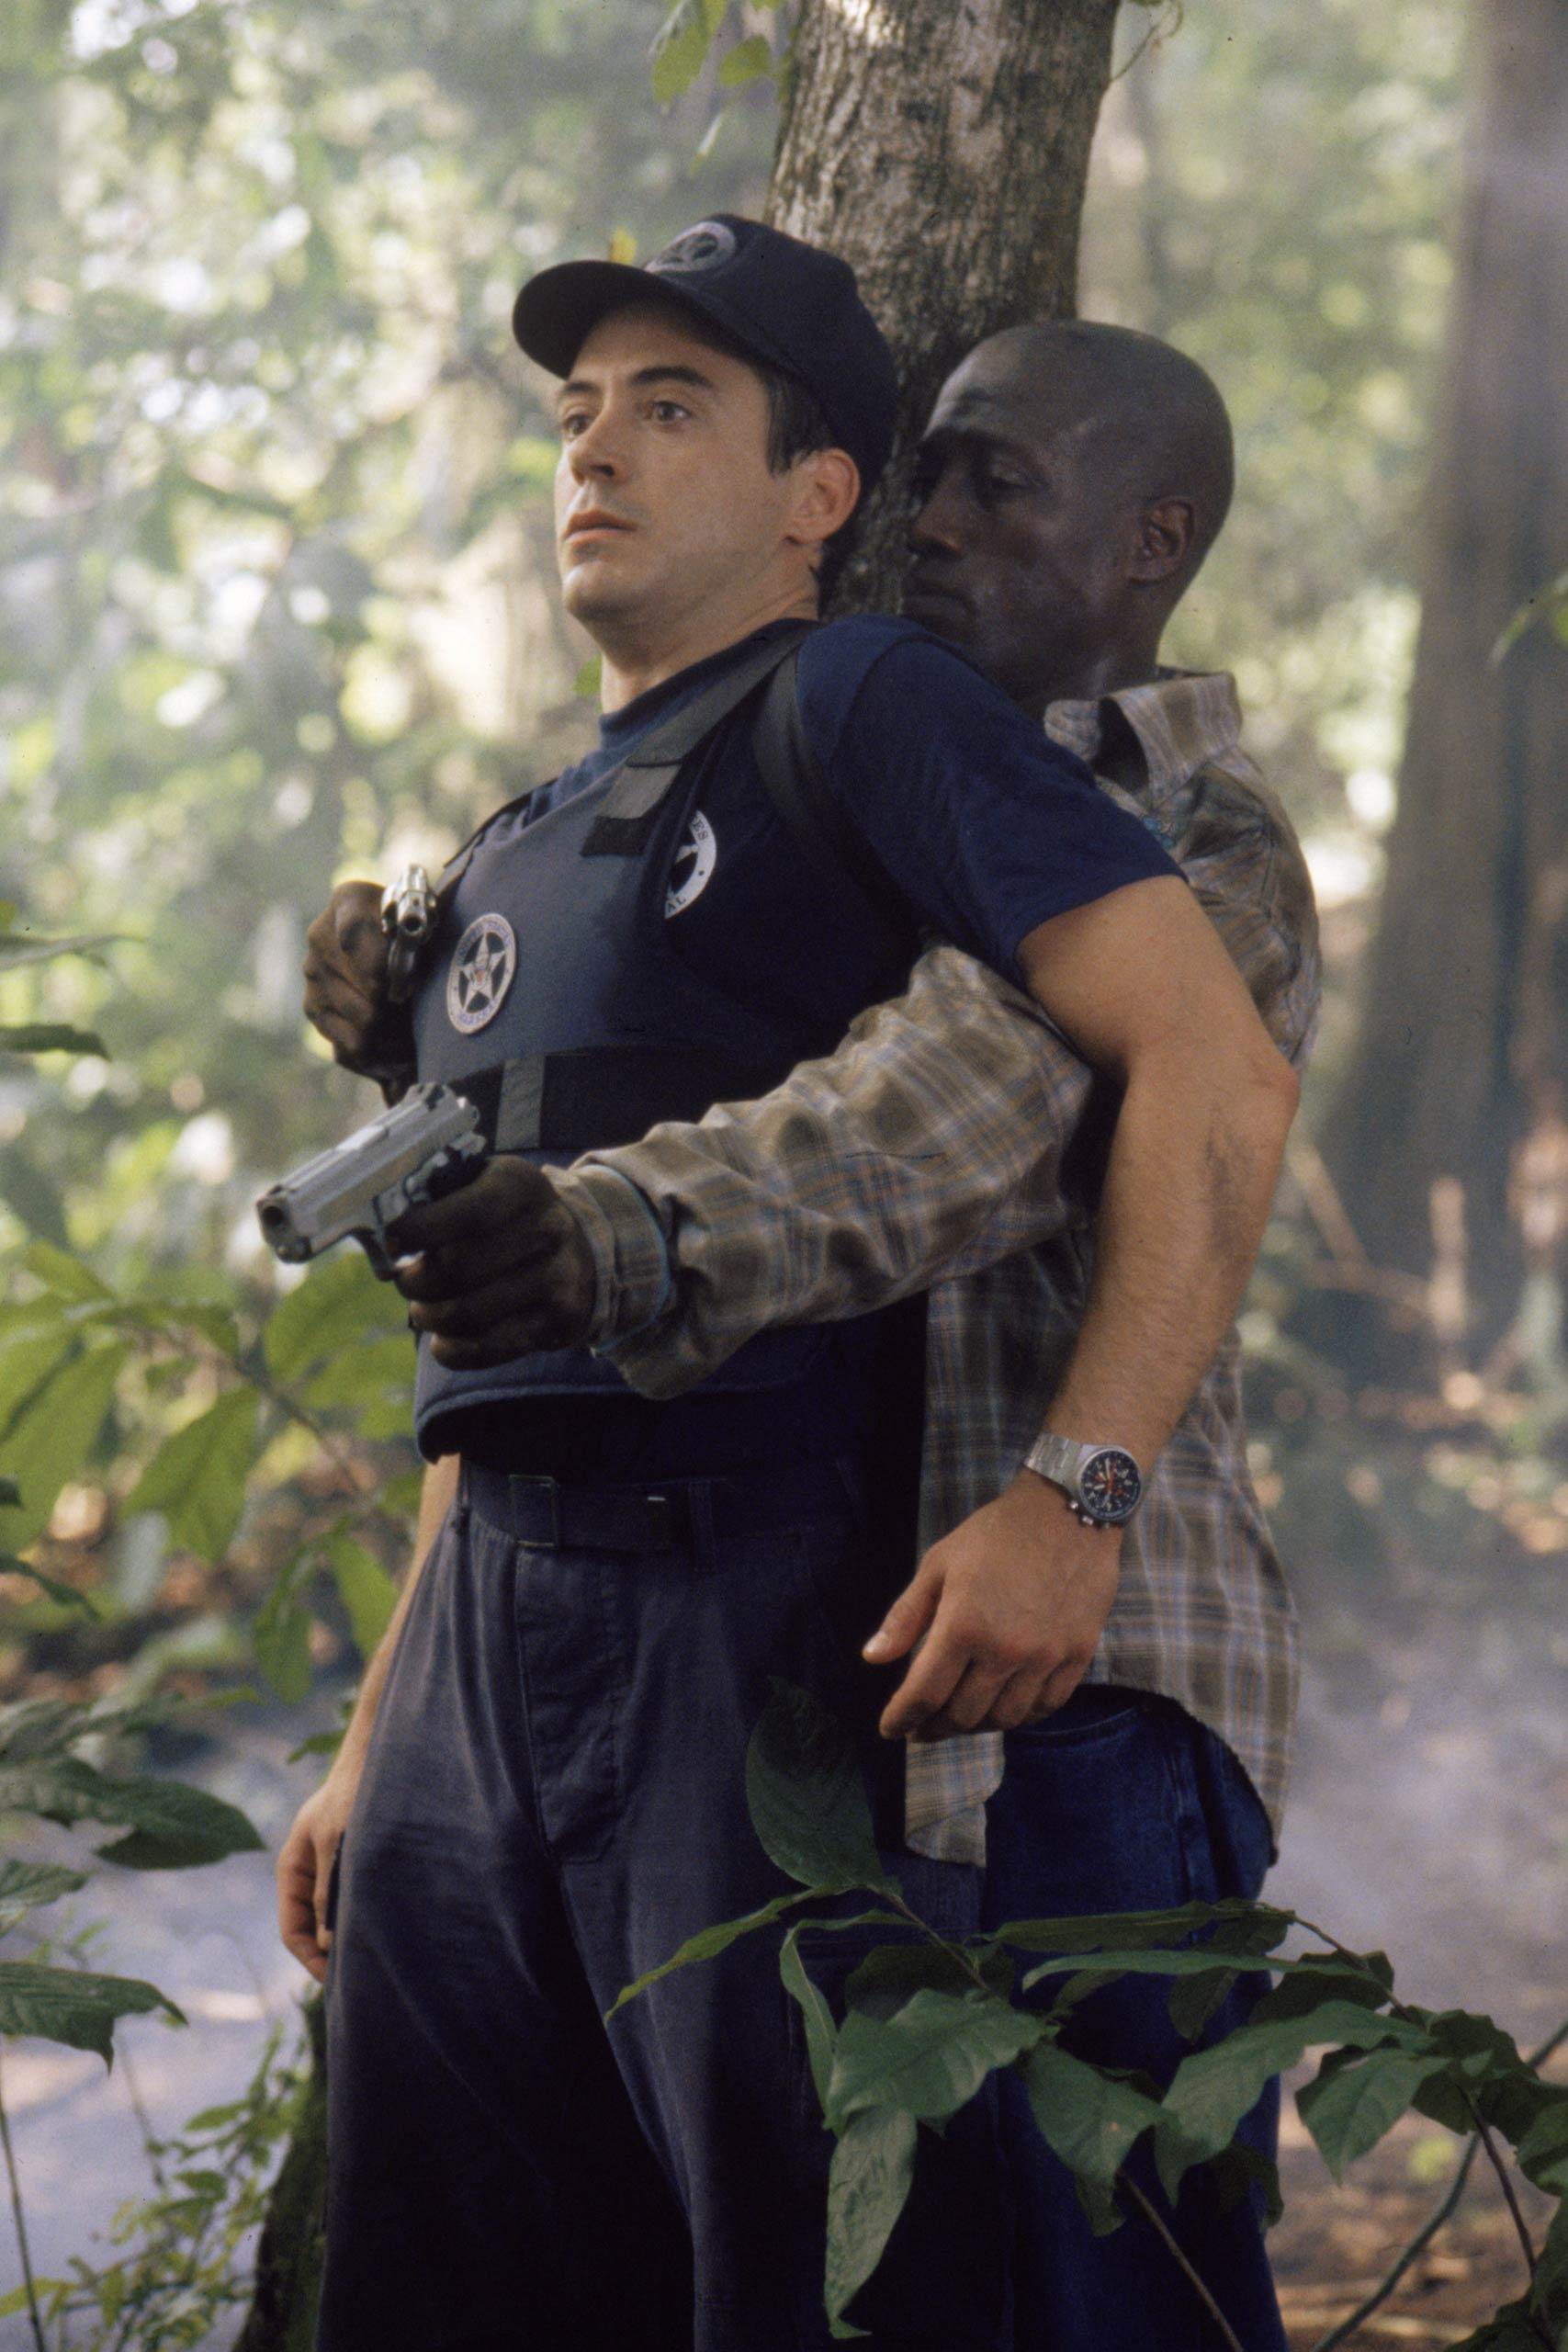 Robert Downey Jr. and Wesley Snipes in <i>U.S. Marshals</i>, 1998.